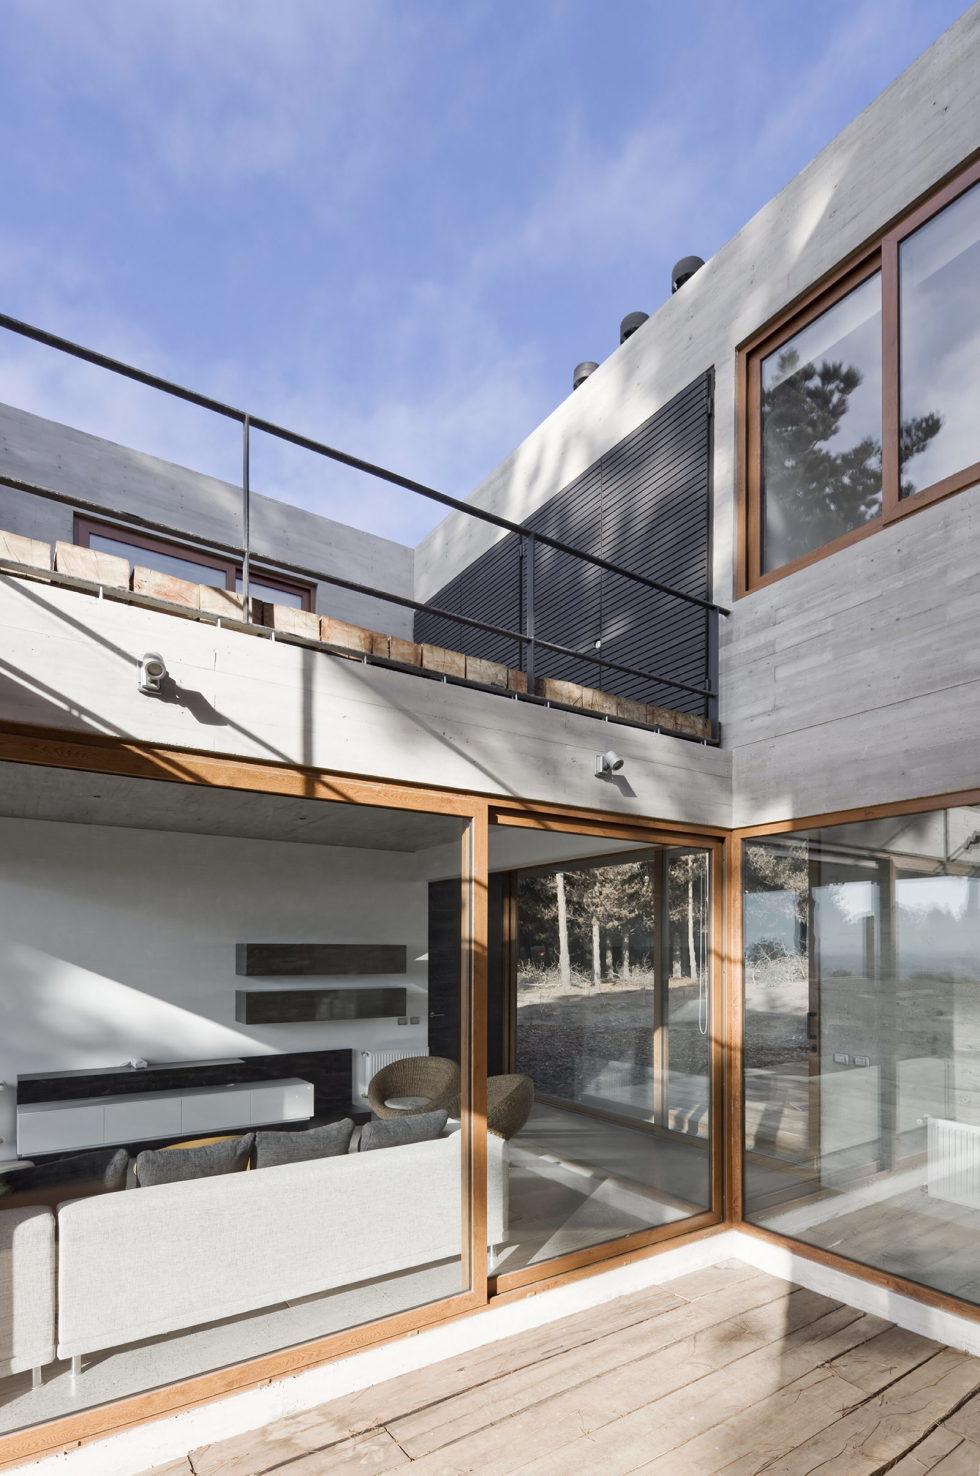 Aguas Claras House In Chile From Ramon Coz + Benjamin Ortiz Studio 30